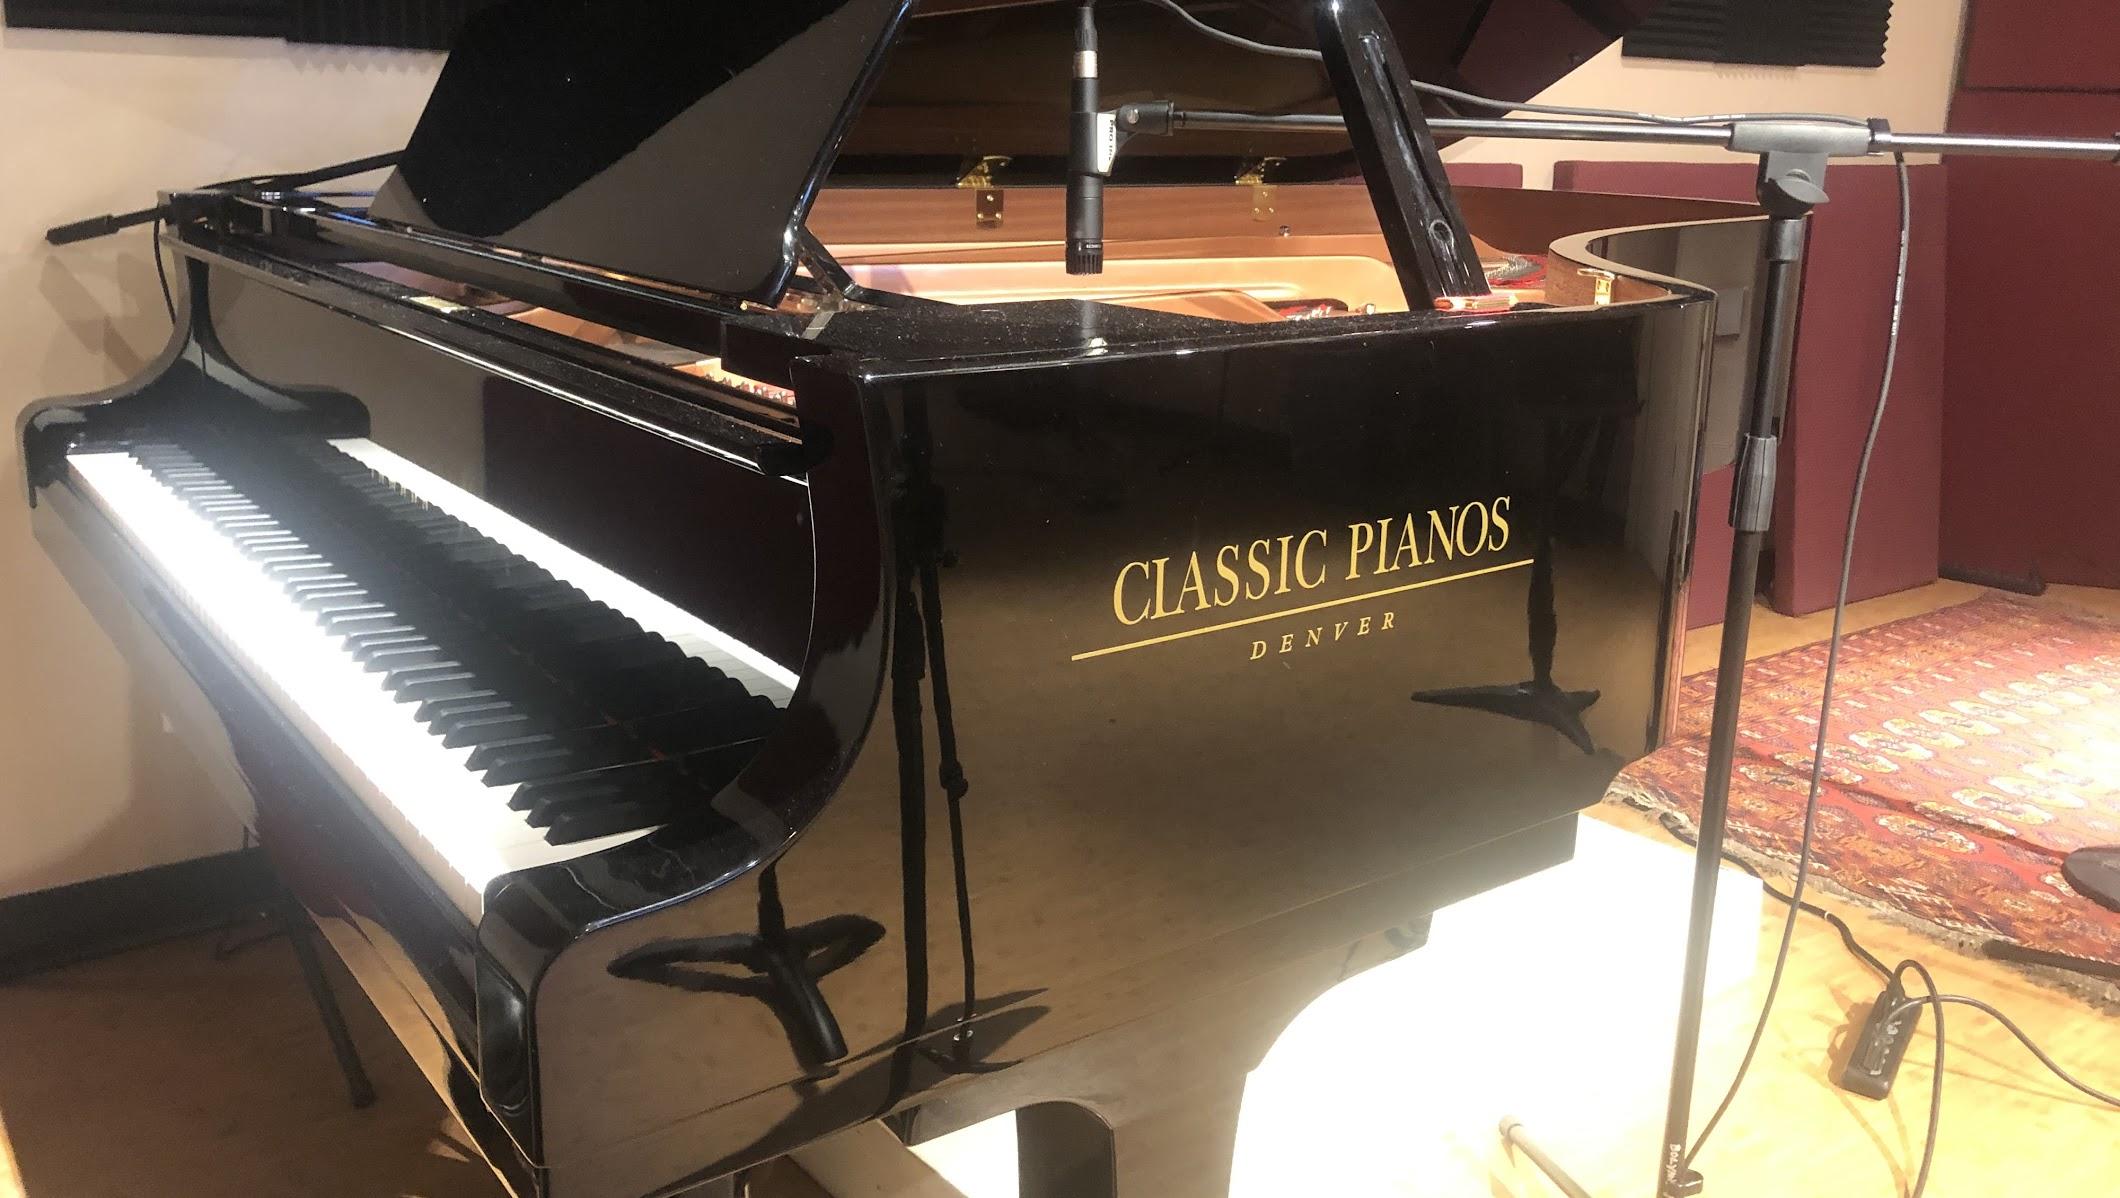 Classic Pianos Concerts